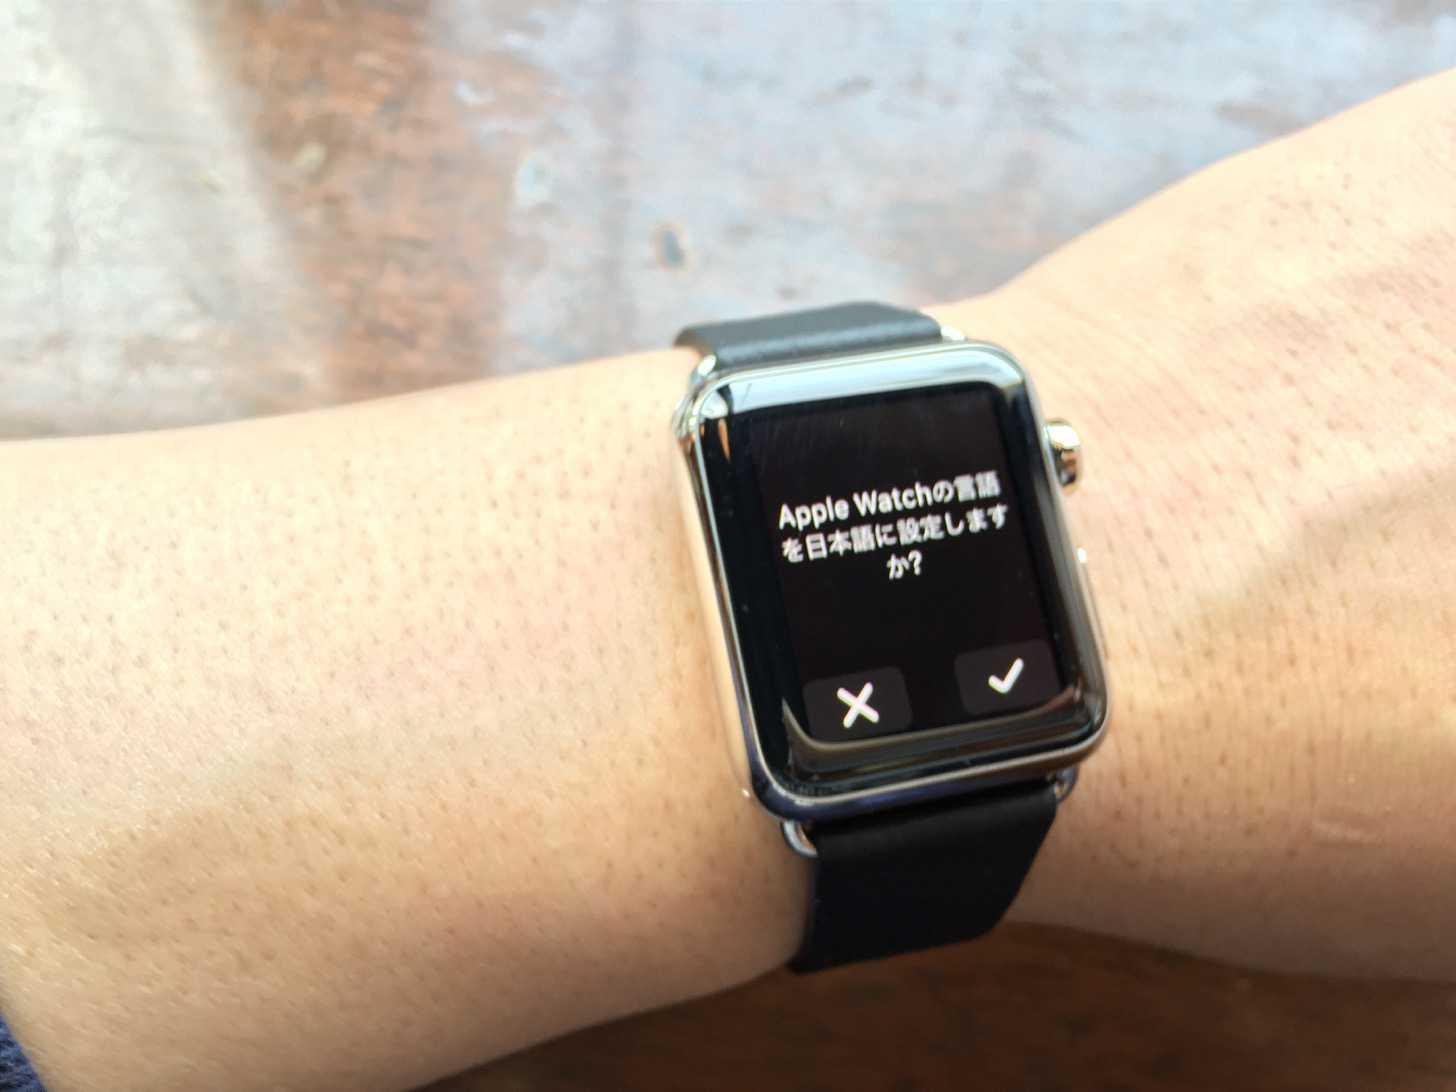 Apple Watchの言語を日本語に設定しますか?